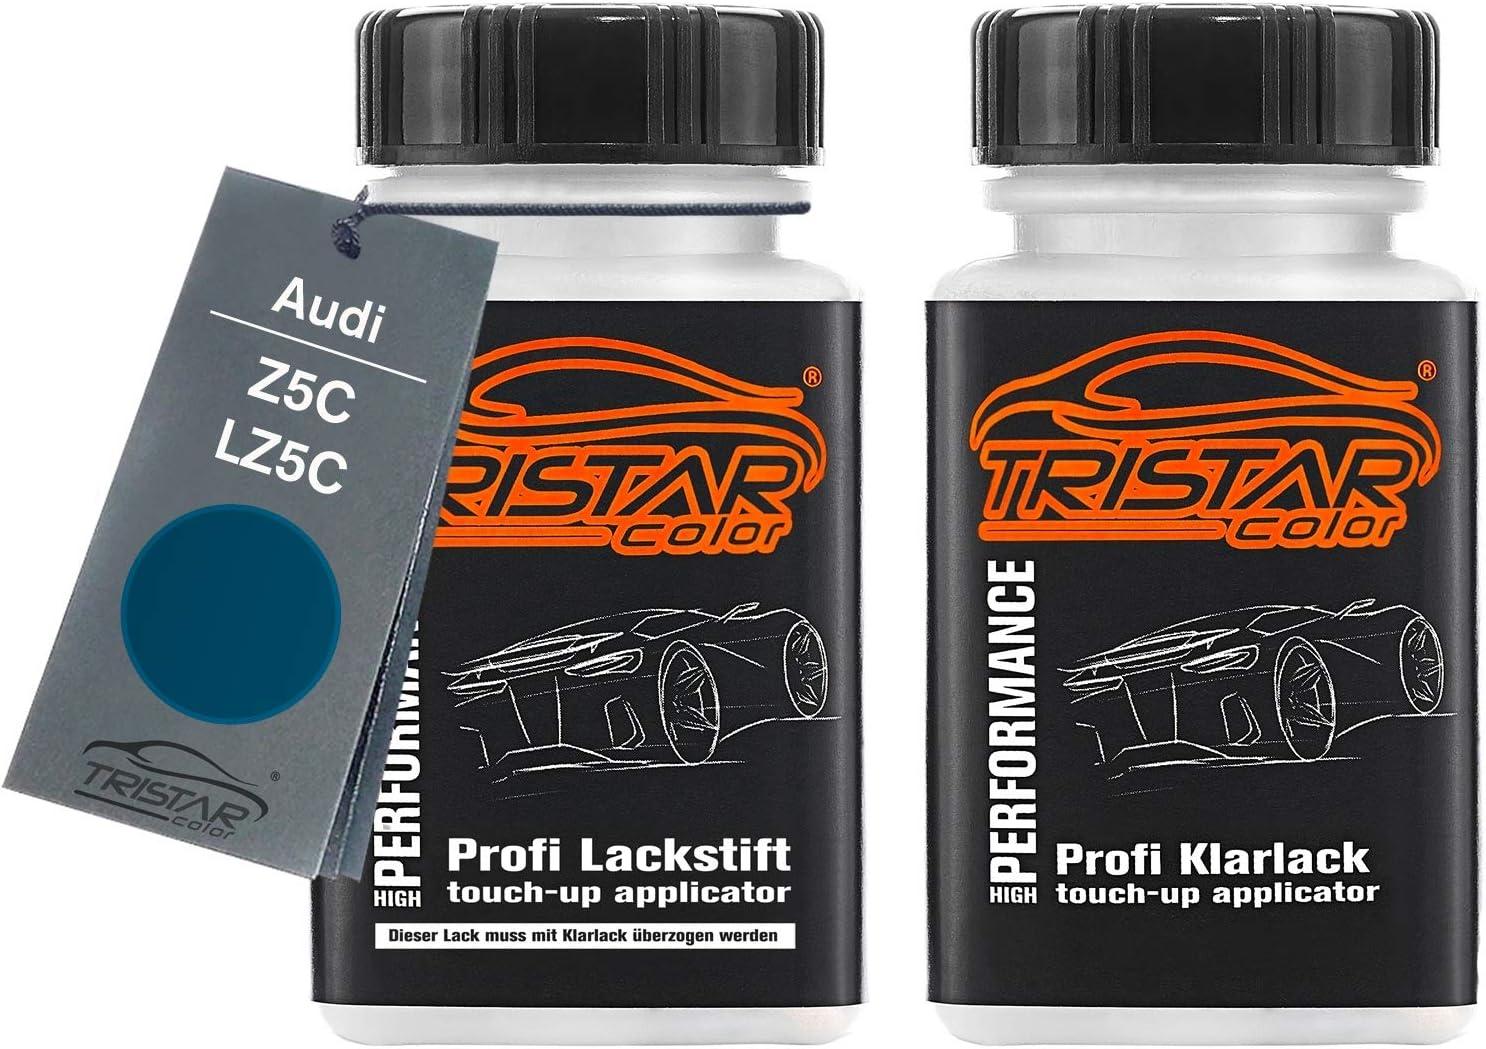 Tristarcolor Autolack Lackstift Set Für Audi Z5c Lz5c Mauritius Blau Perl Metallic Basislack Klarlack Je 50ml Auto